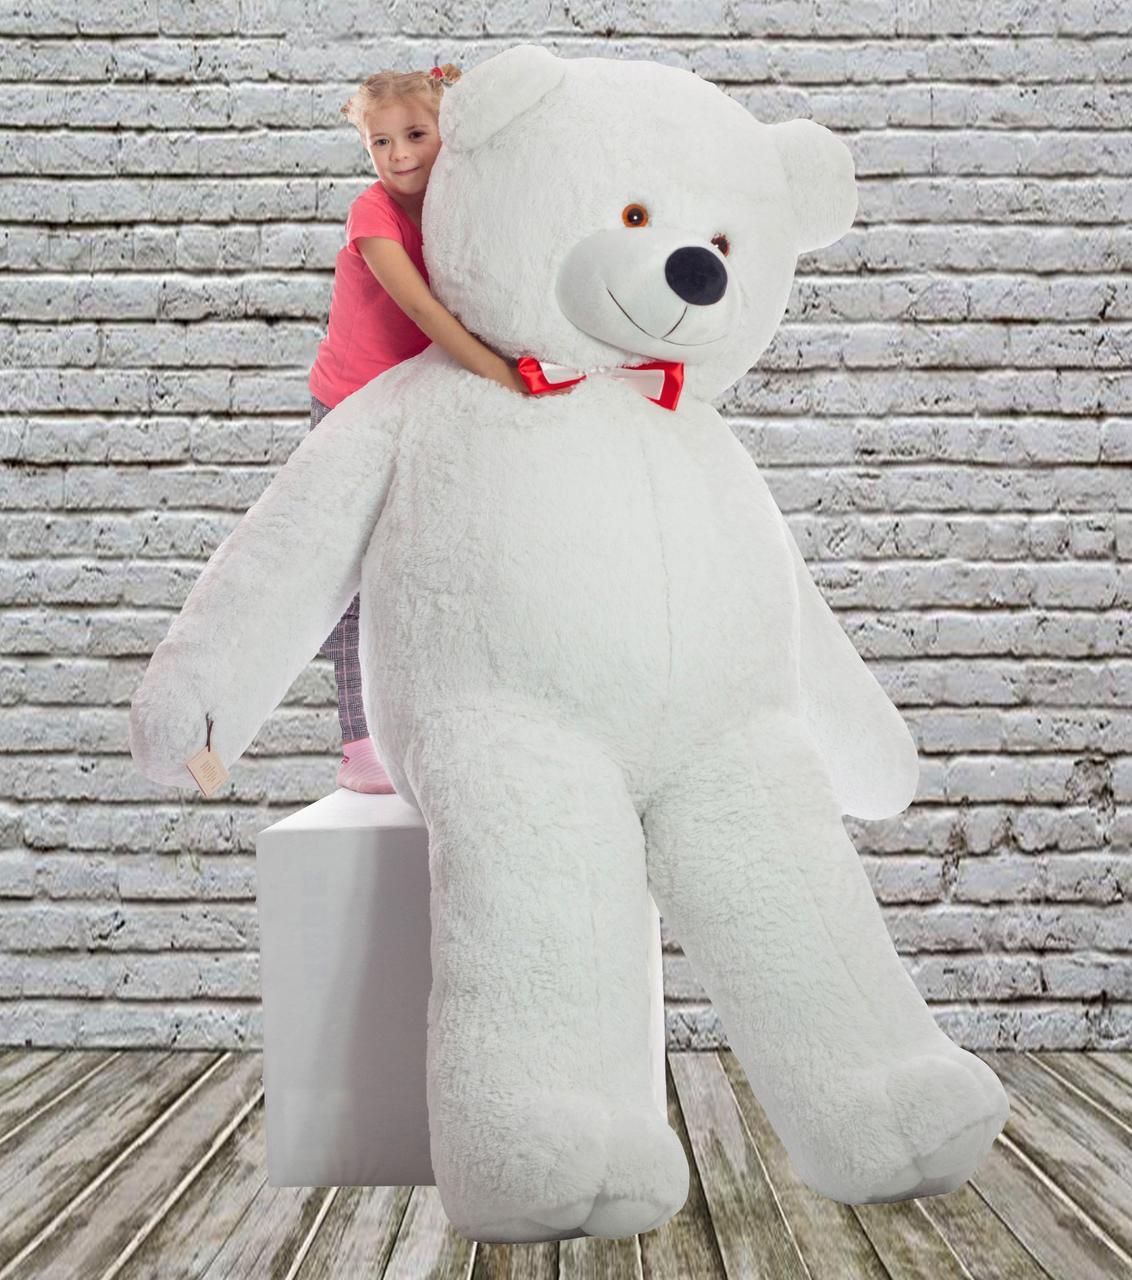 Плюшевий ведмедик Mister Medved Білий 2 м 50 см